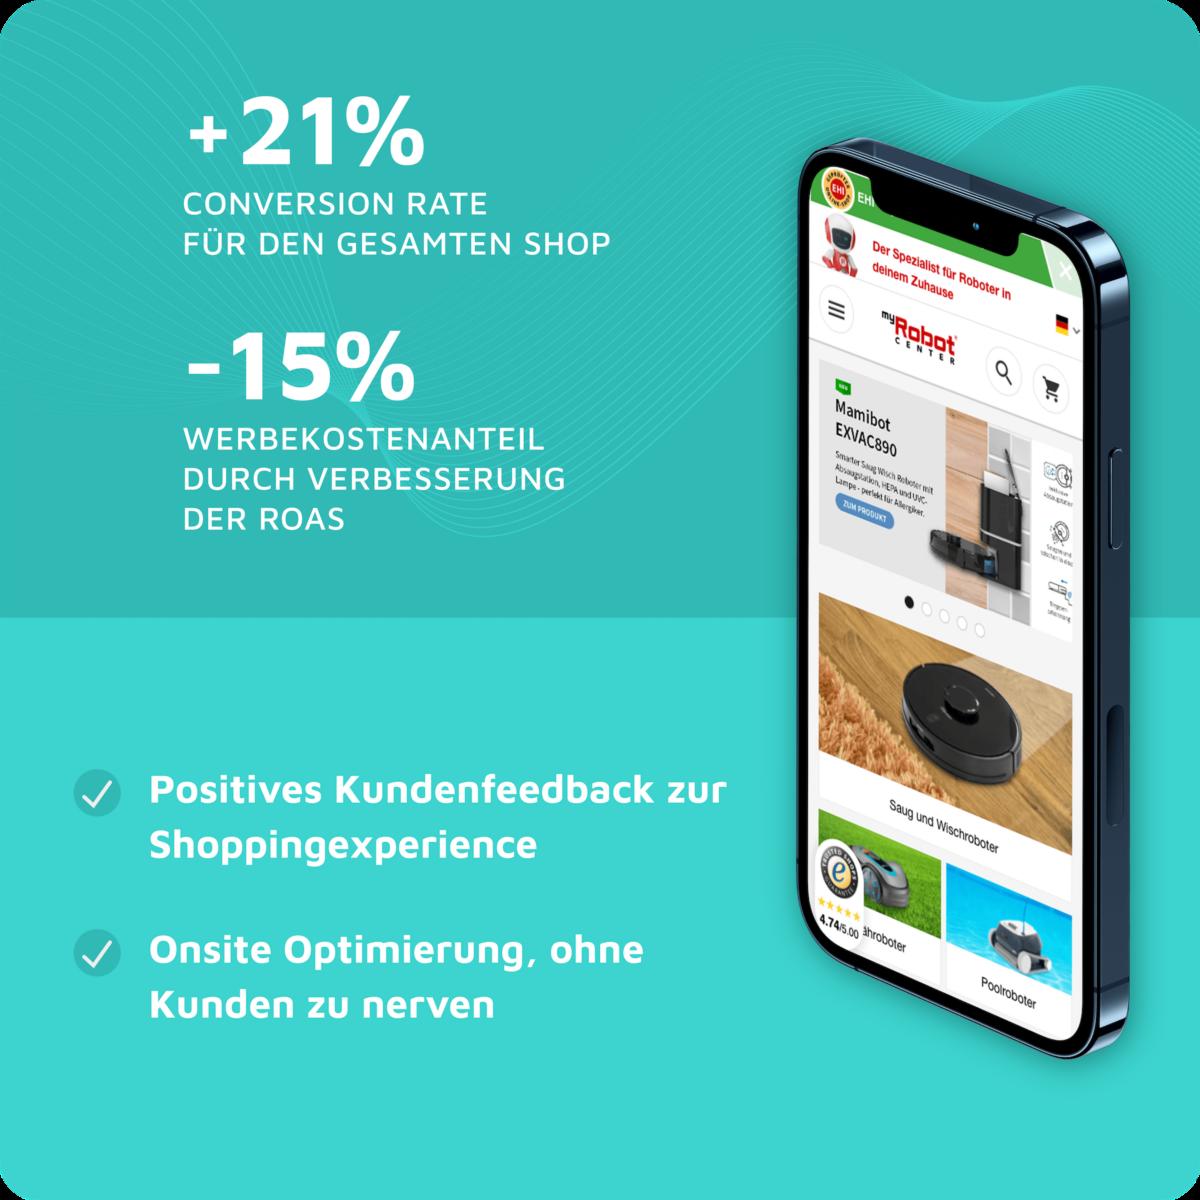 myRobotCenter online Shp reduziert Kaufabbrüche